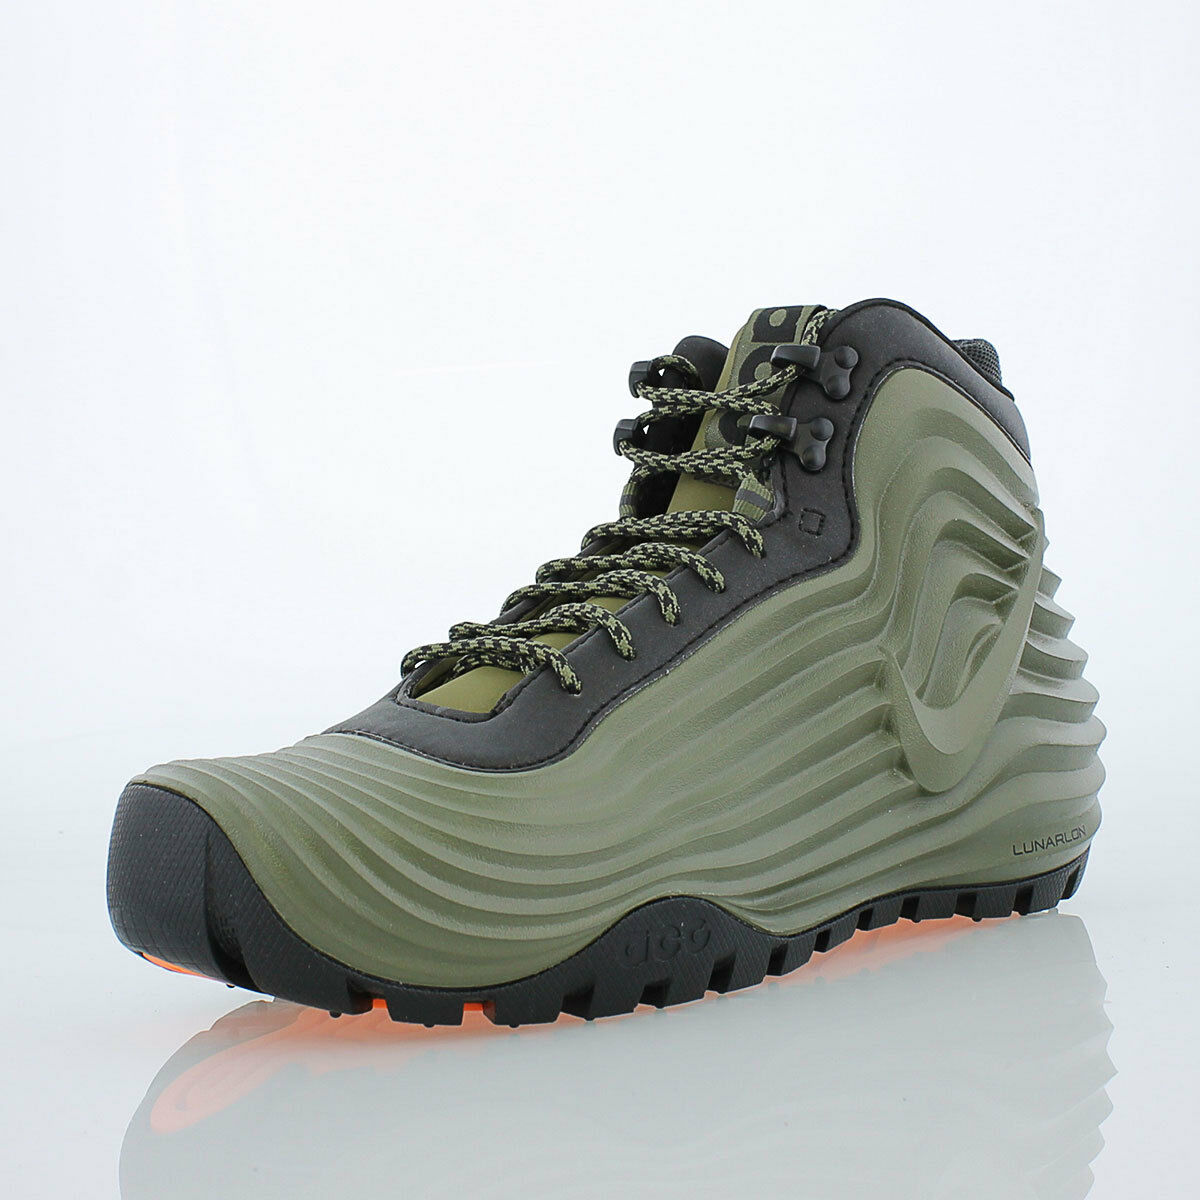 Nike Lunardome 1 Sneakerboot Shoe Mens size 7 Medium Olive/Black 654867-200